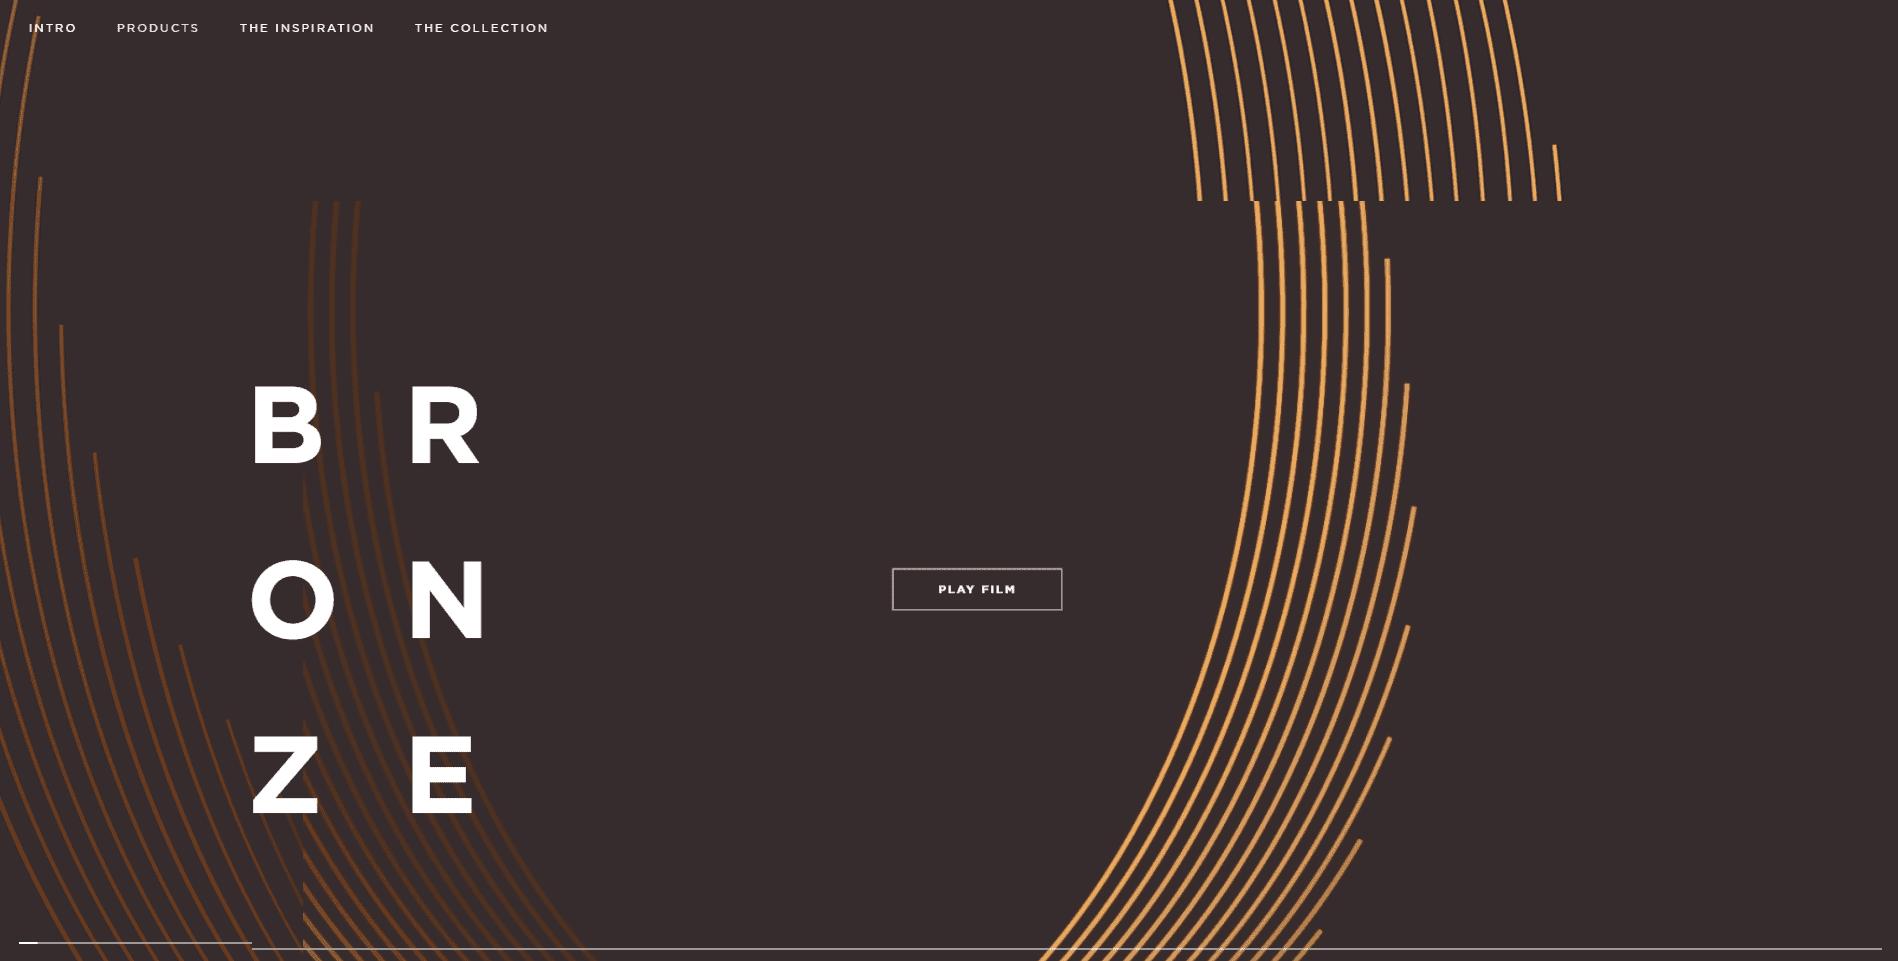 Bang Olufson asymmetrical web design layout